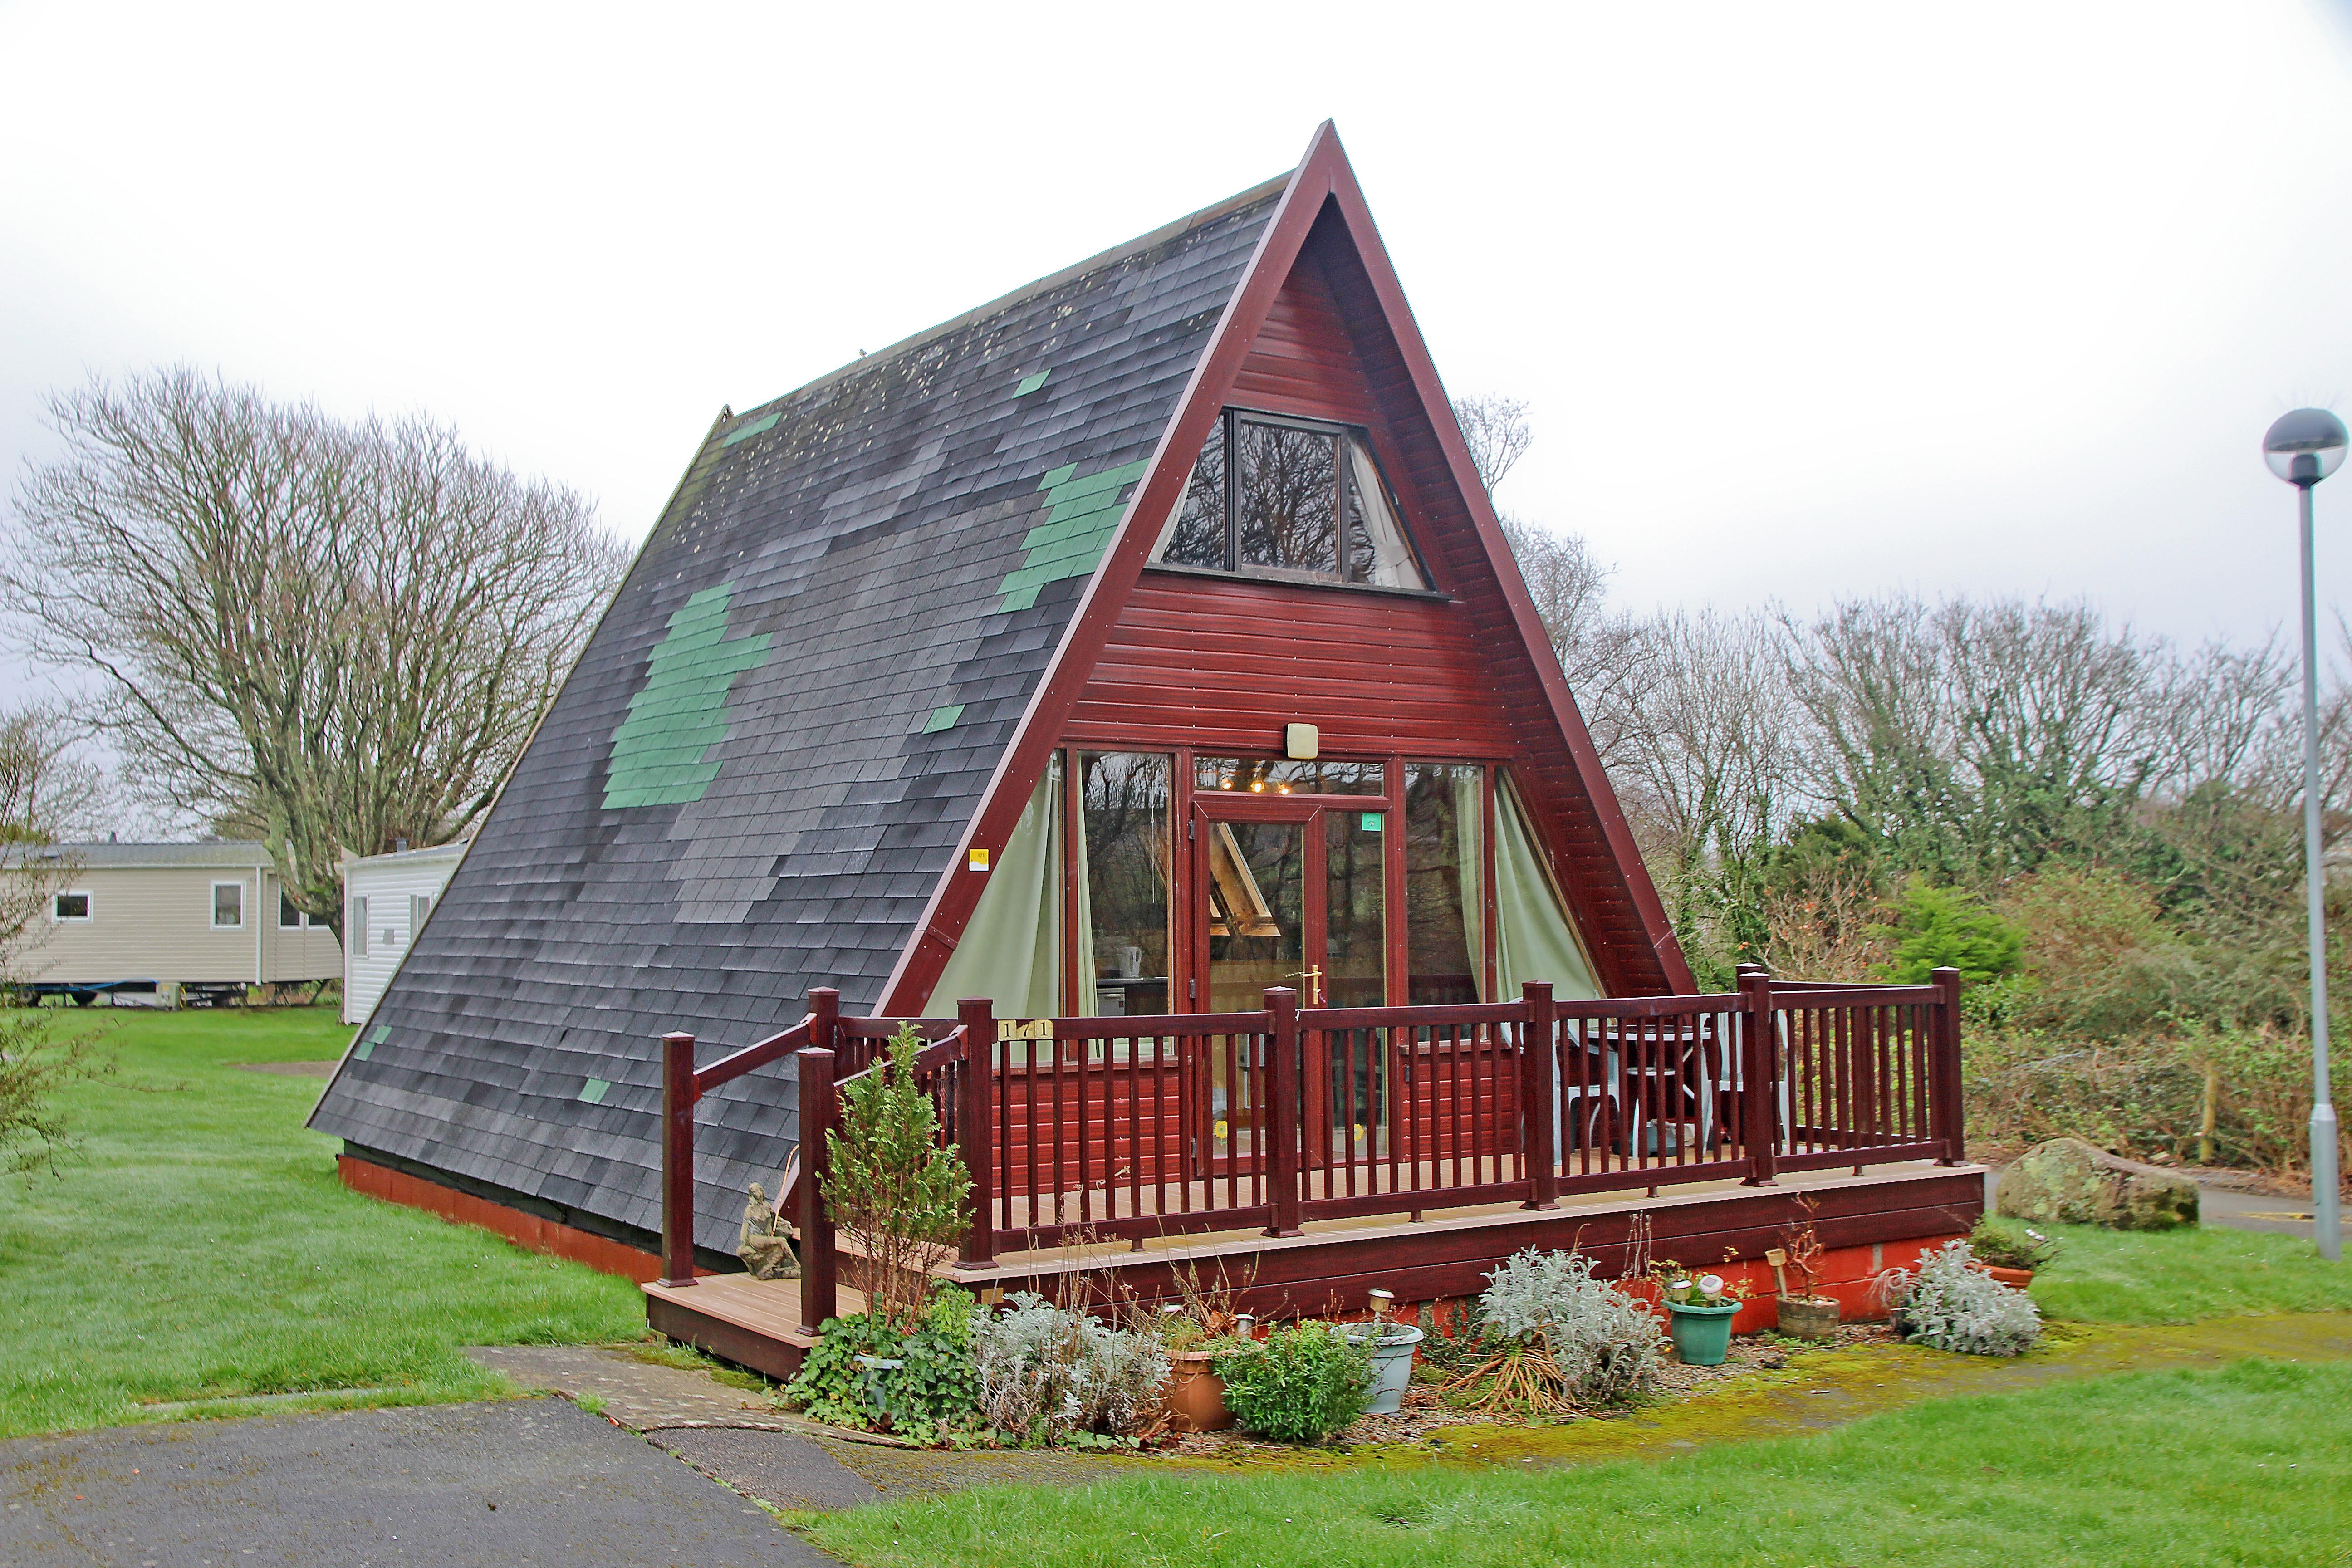 Hafan y Mor Holiday Park, Chwilog, North Wales